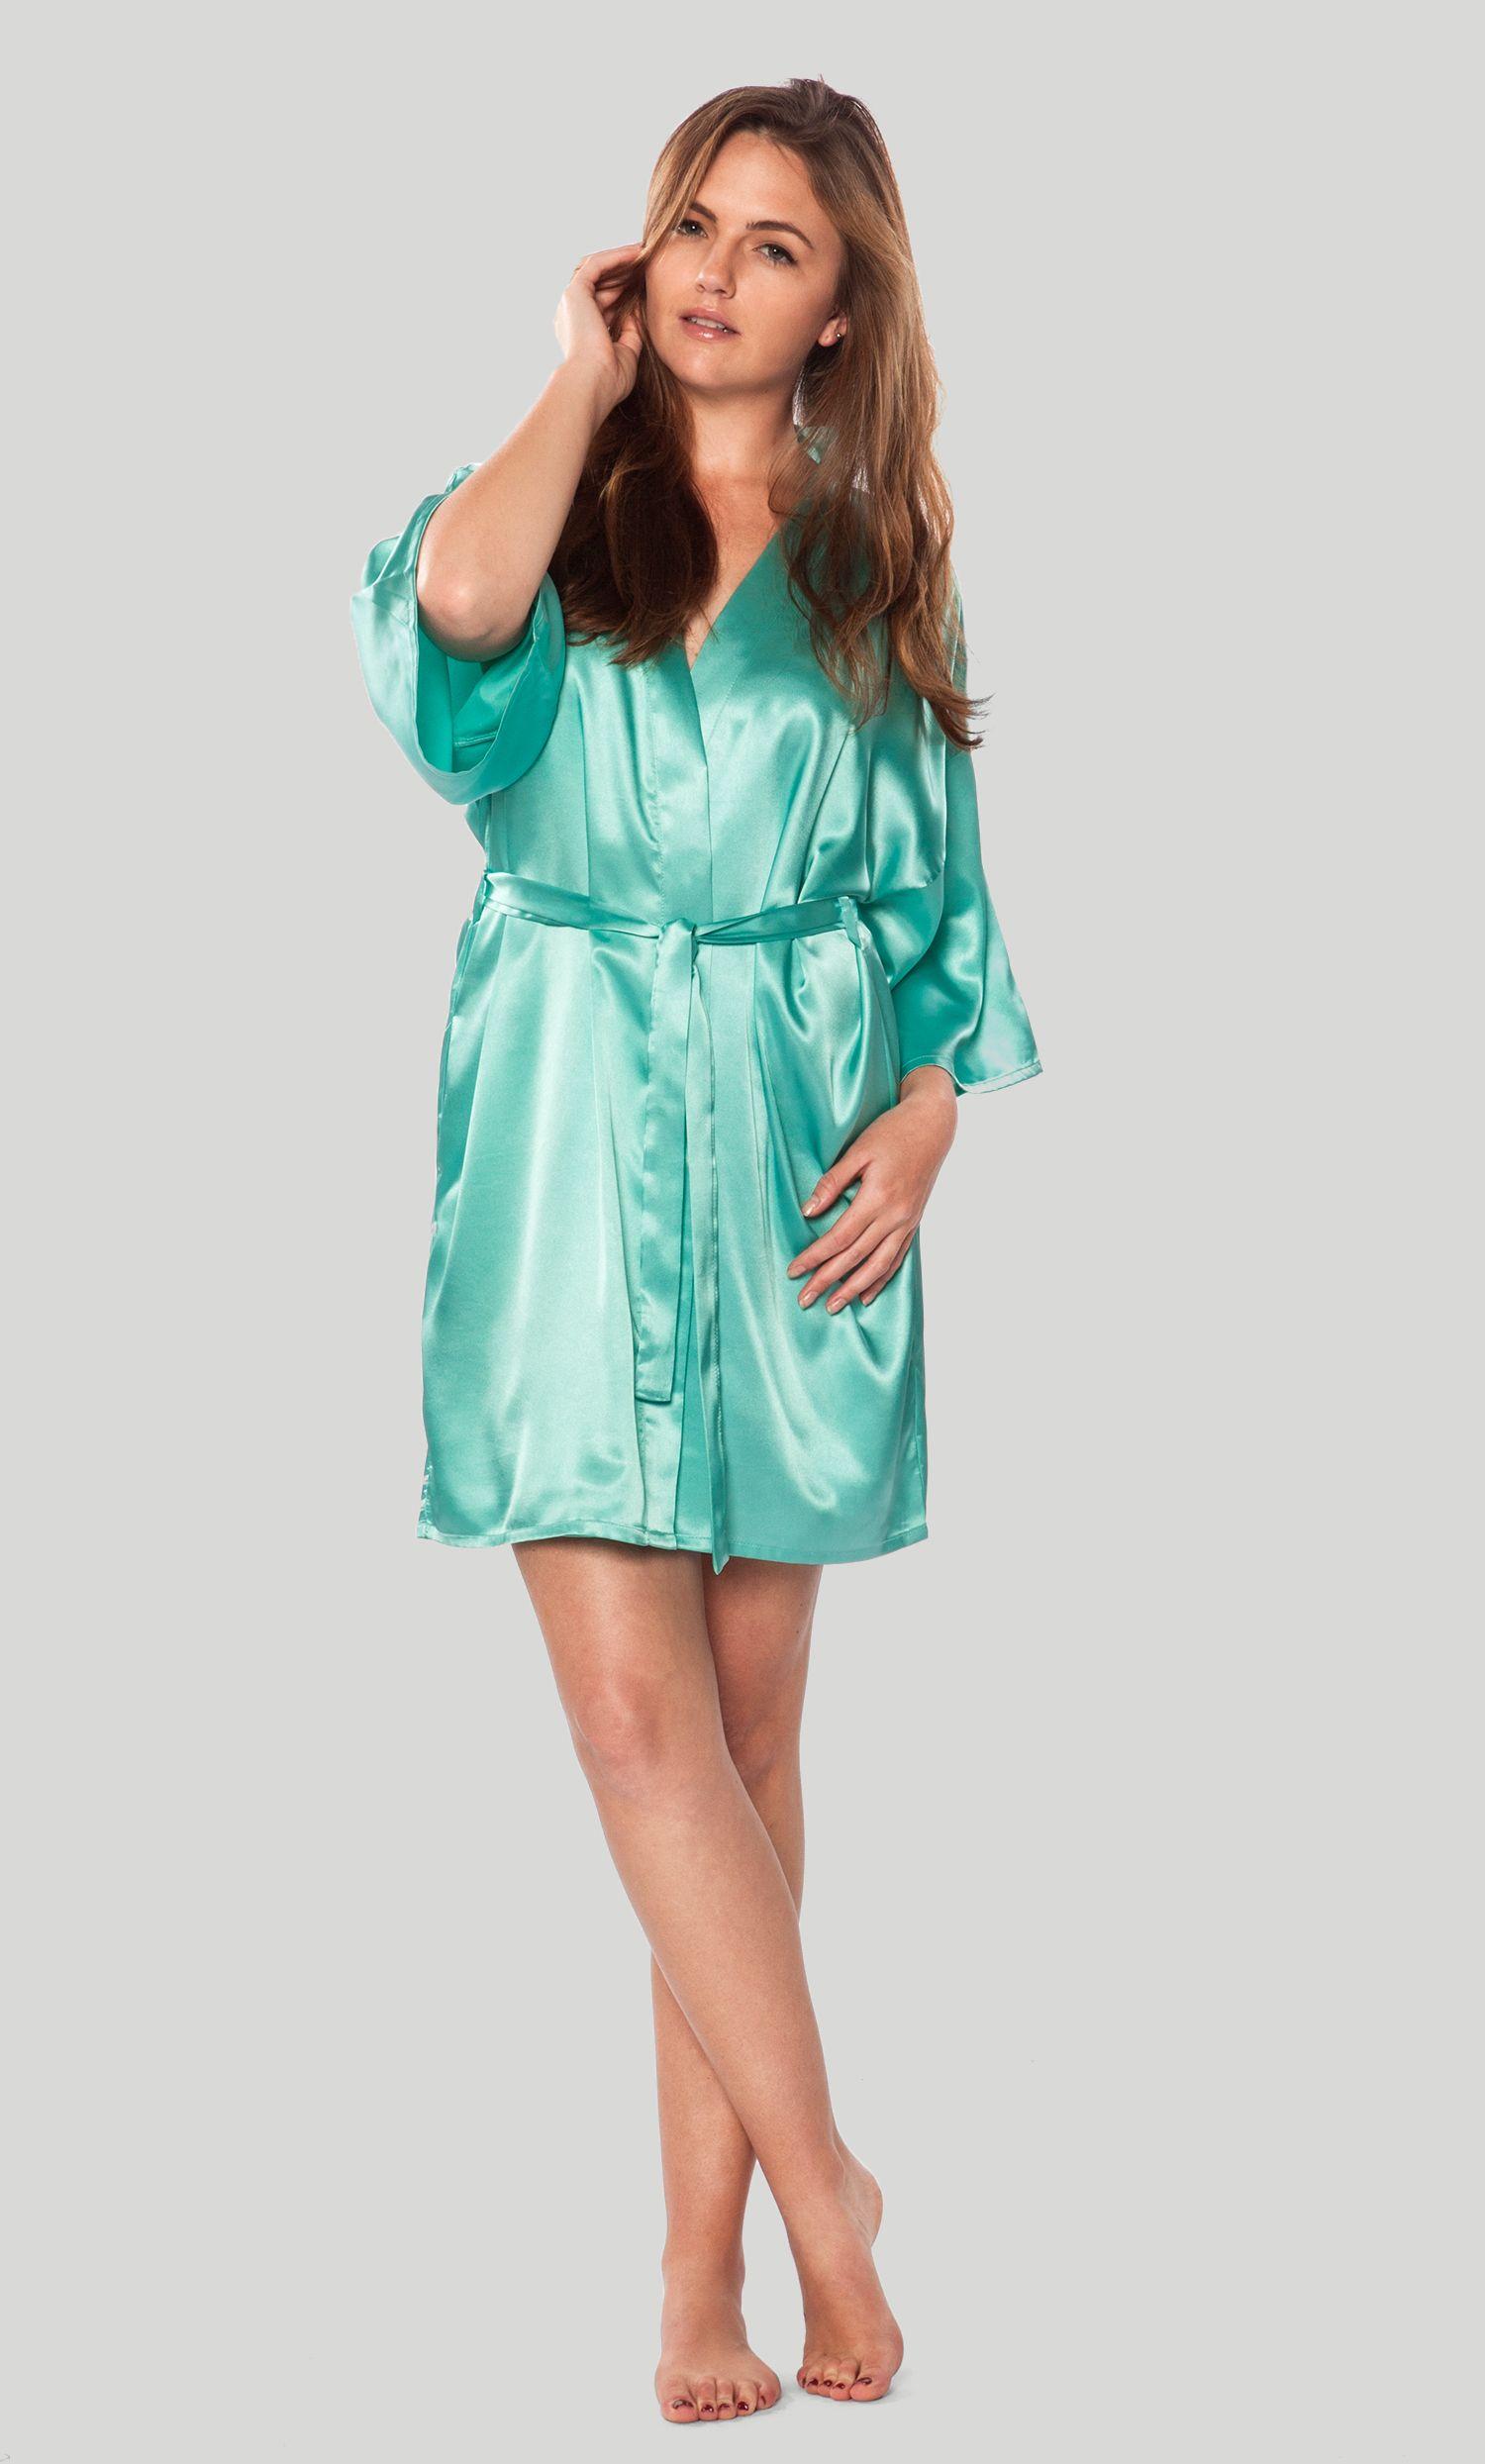 cb67e7abfe Premium Bathrobes    Satin Robes    Satin Kimono Mint Green Short Robe -  Wholesale bathrobes